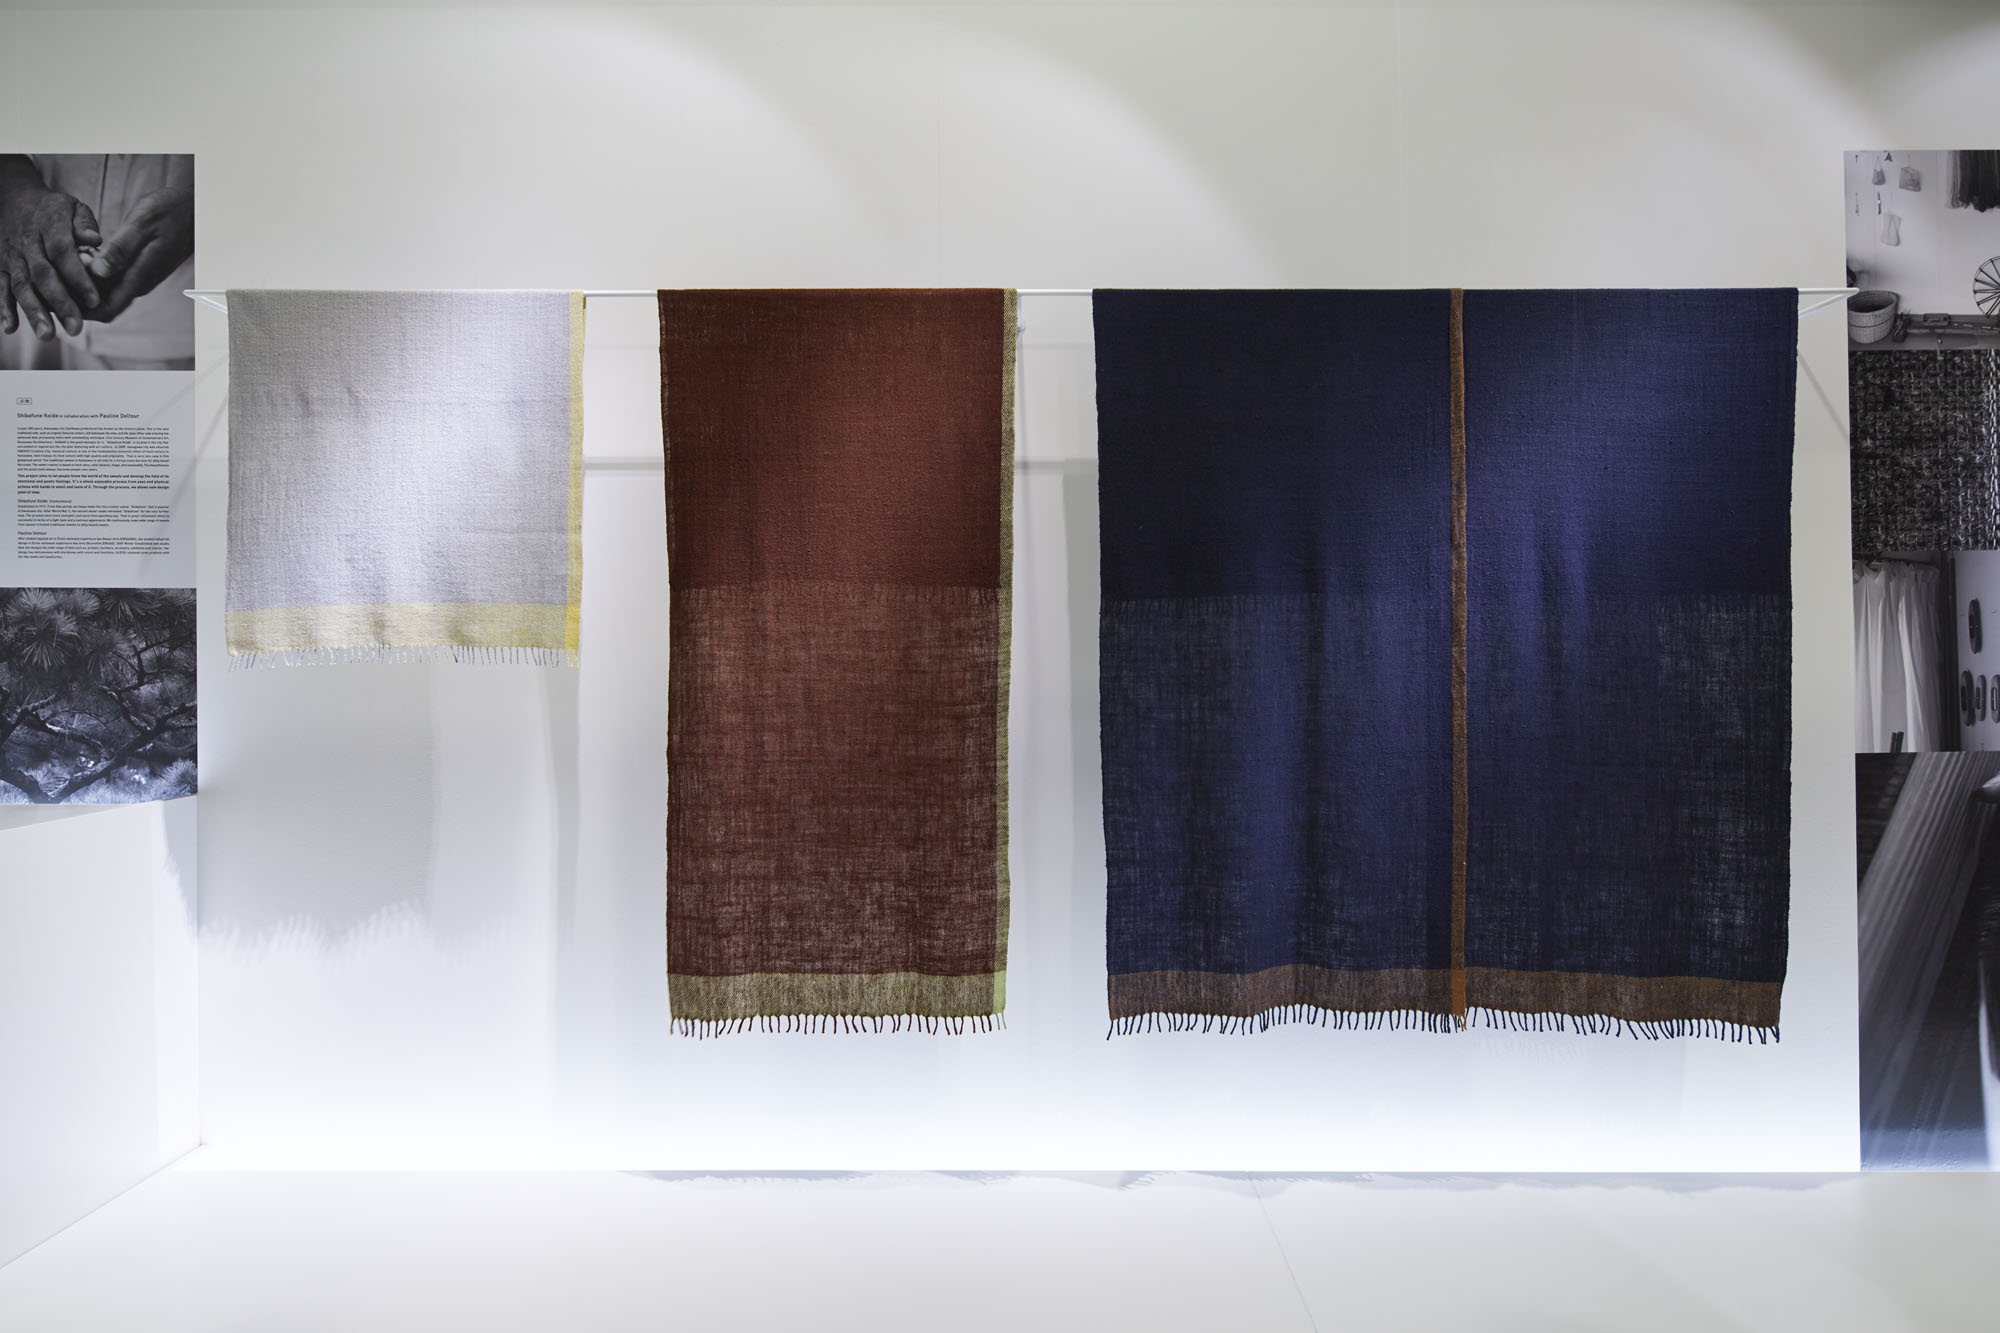 JC09 Art and Textile Workshop× Cecilie Manz